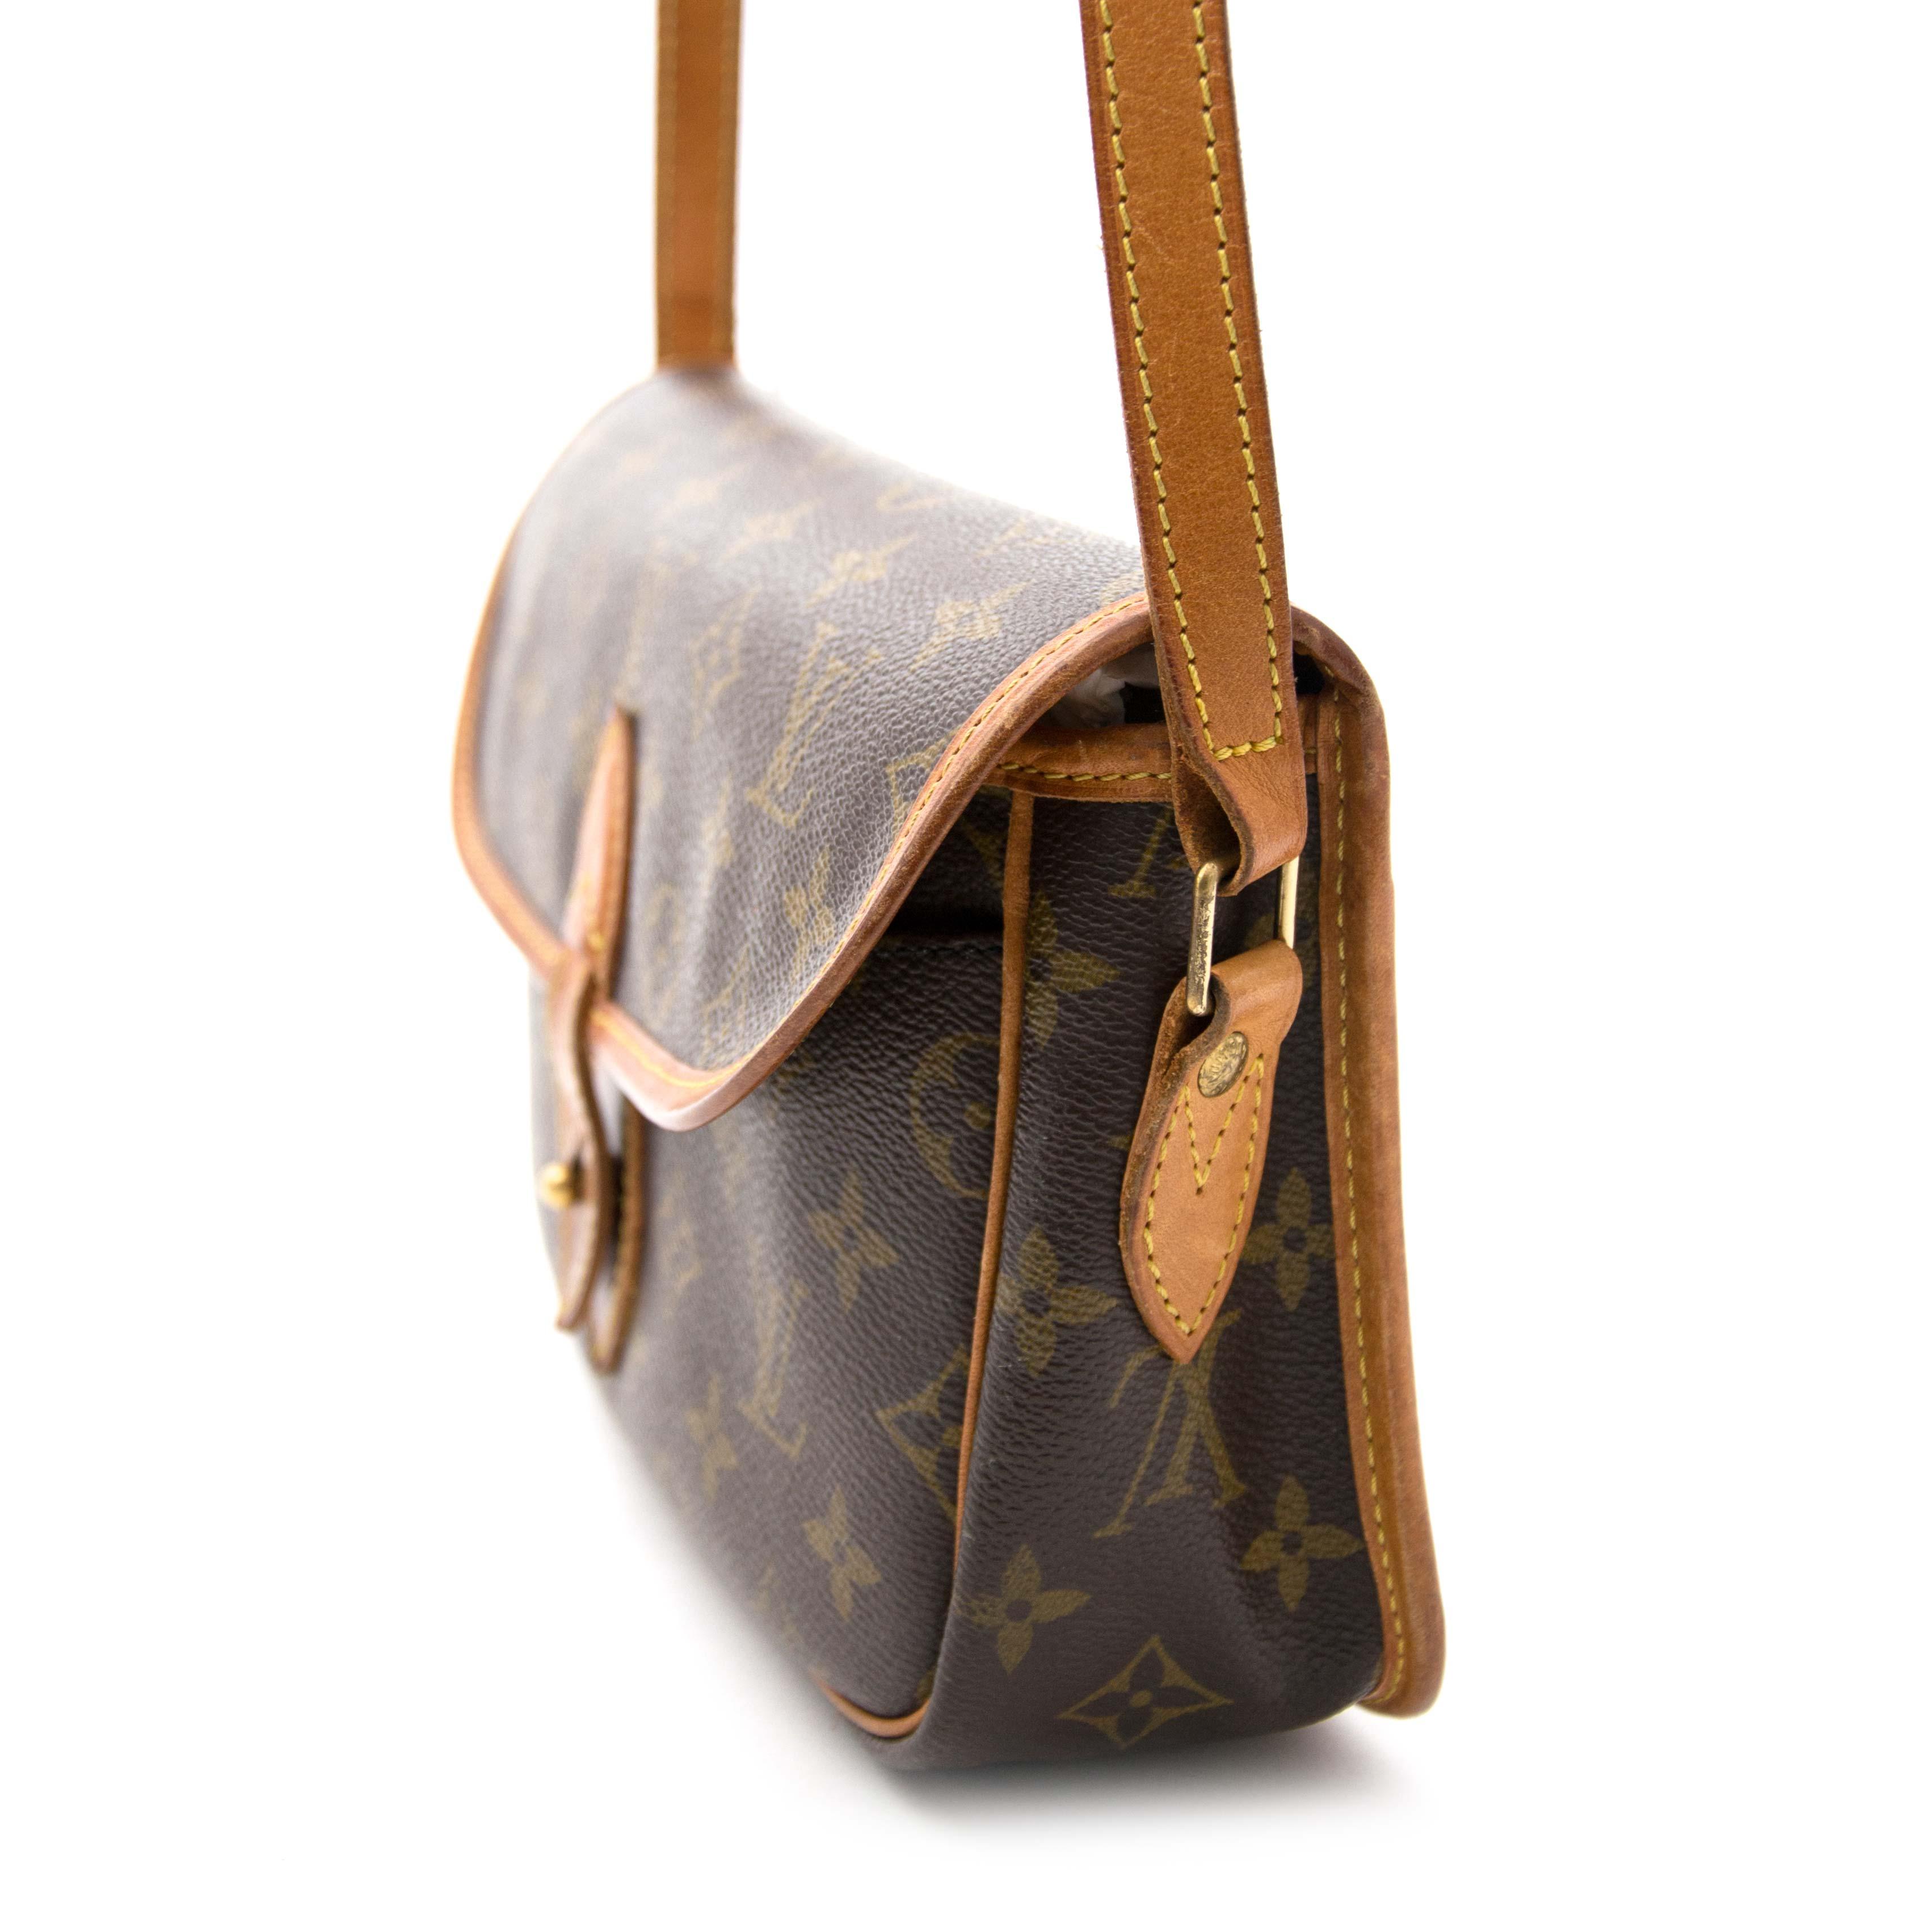 Sac Louis Vuitton Occasion Marseille : Authentic vintage luxury designer handbags